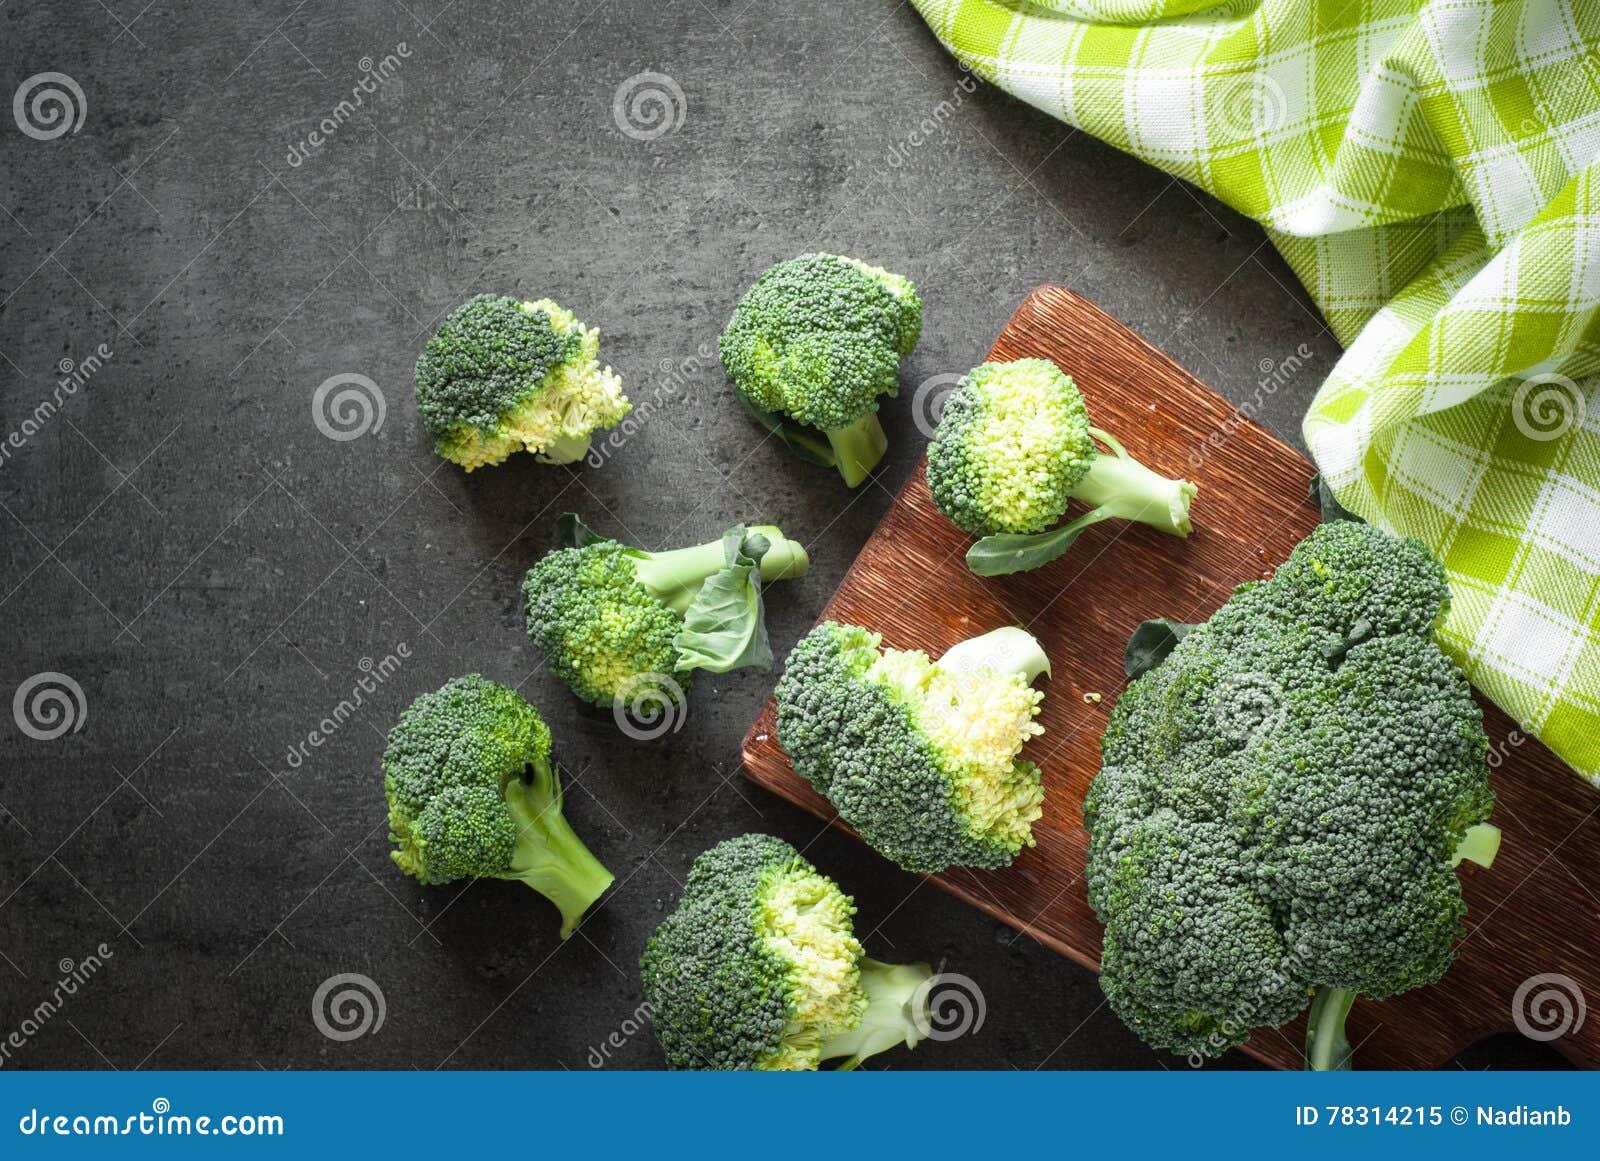 Fresh broccoli at dark table.